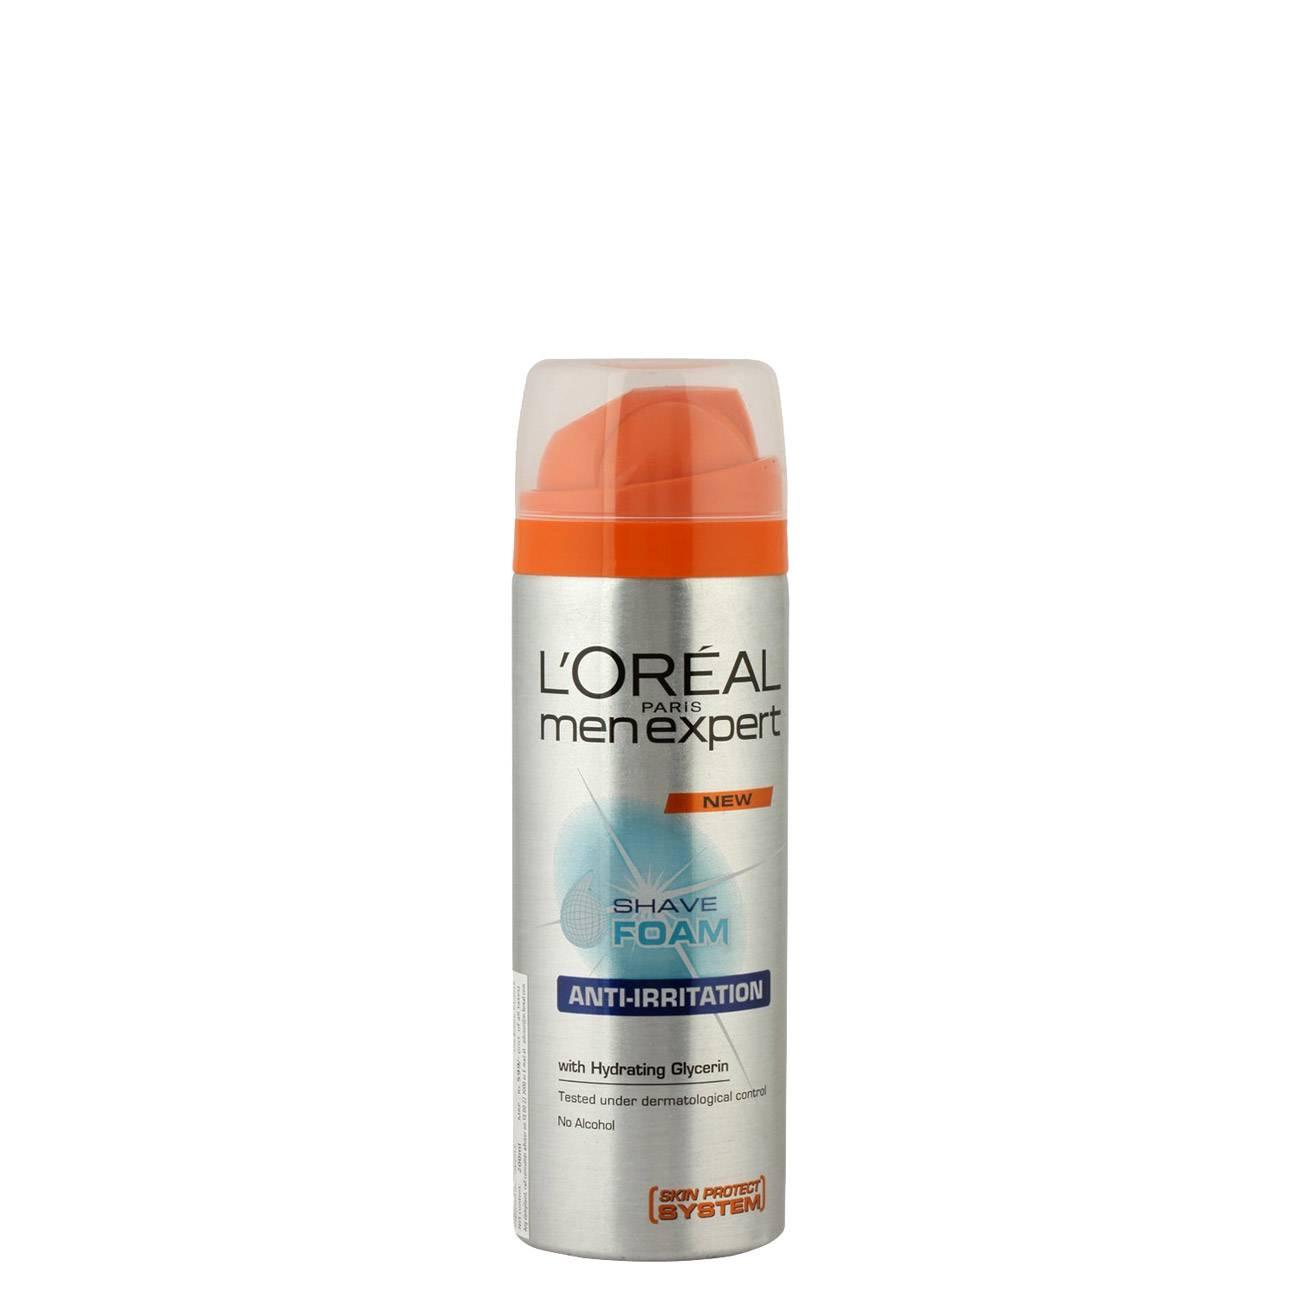 Shaving Foam 200 Ml L'Oreal imagine 2021 bestvalue.eu